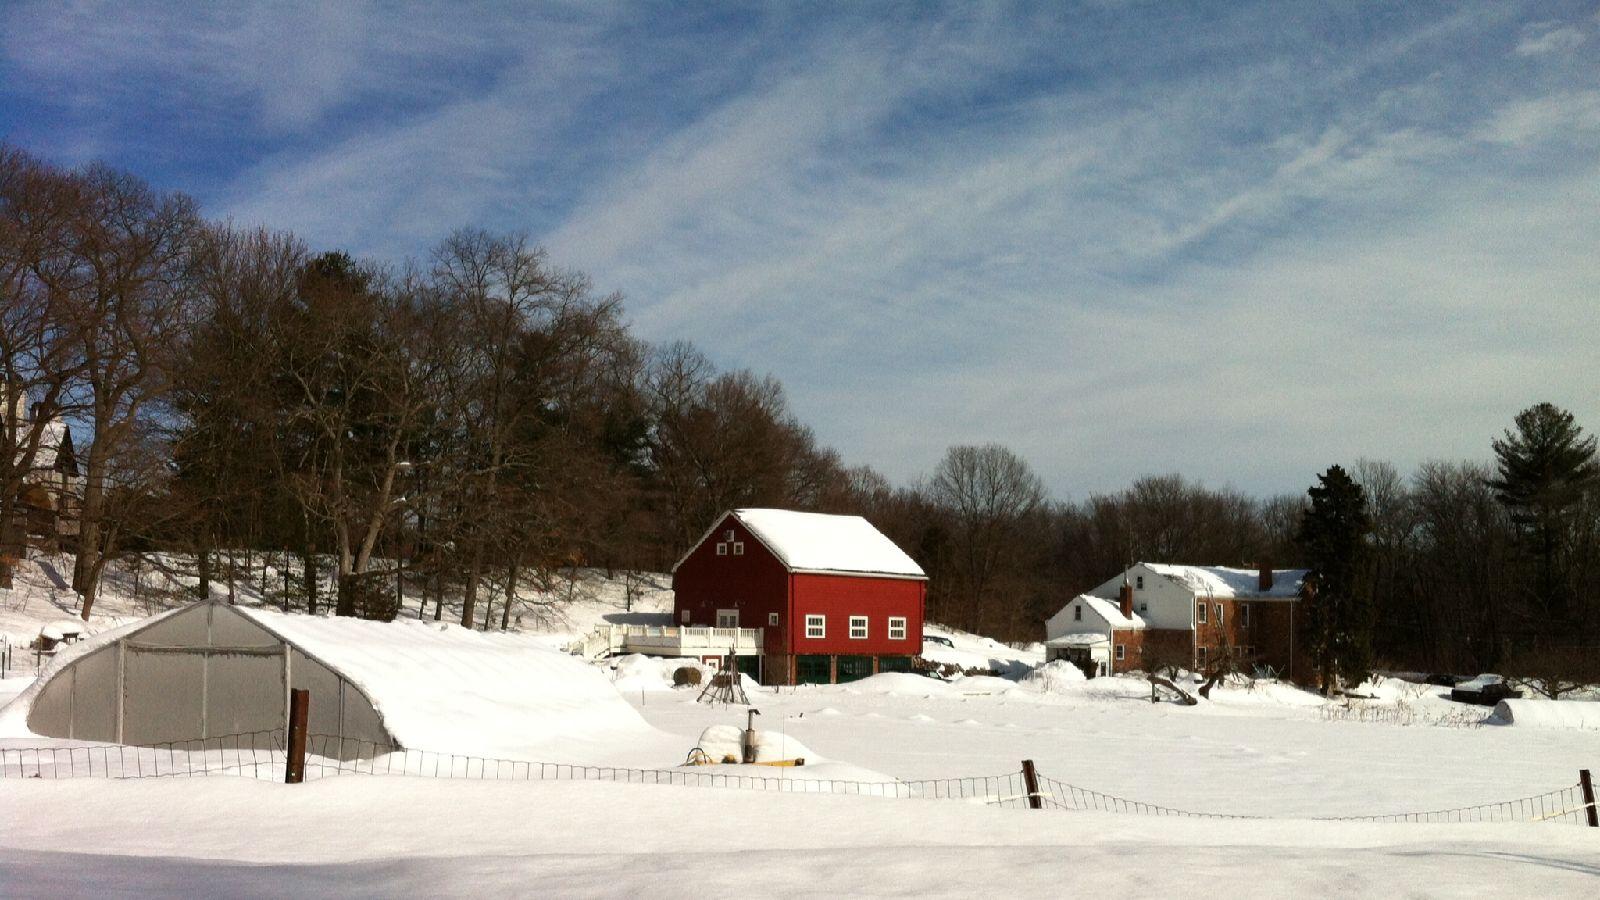 Snowy_farm_2_15.jpg